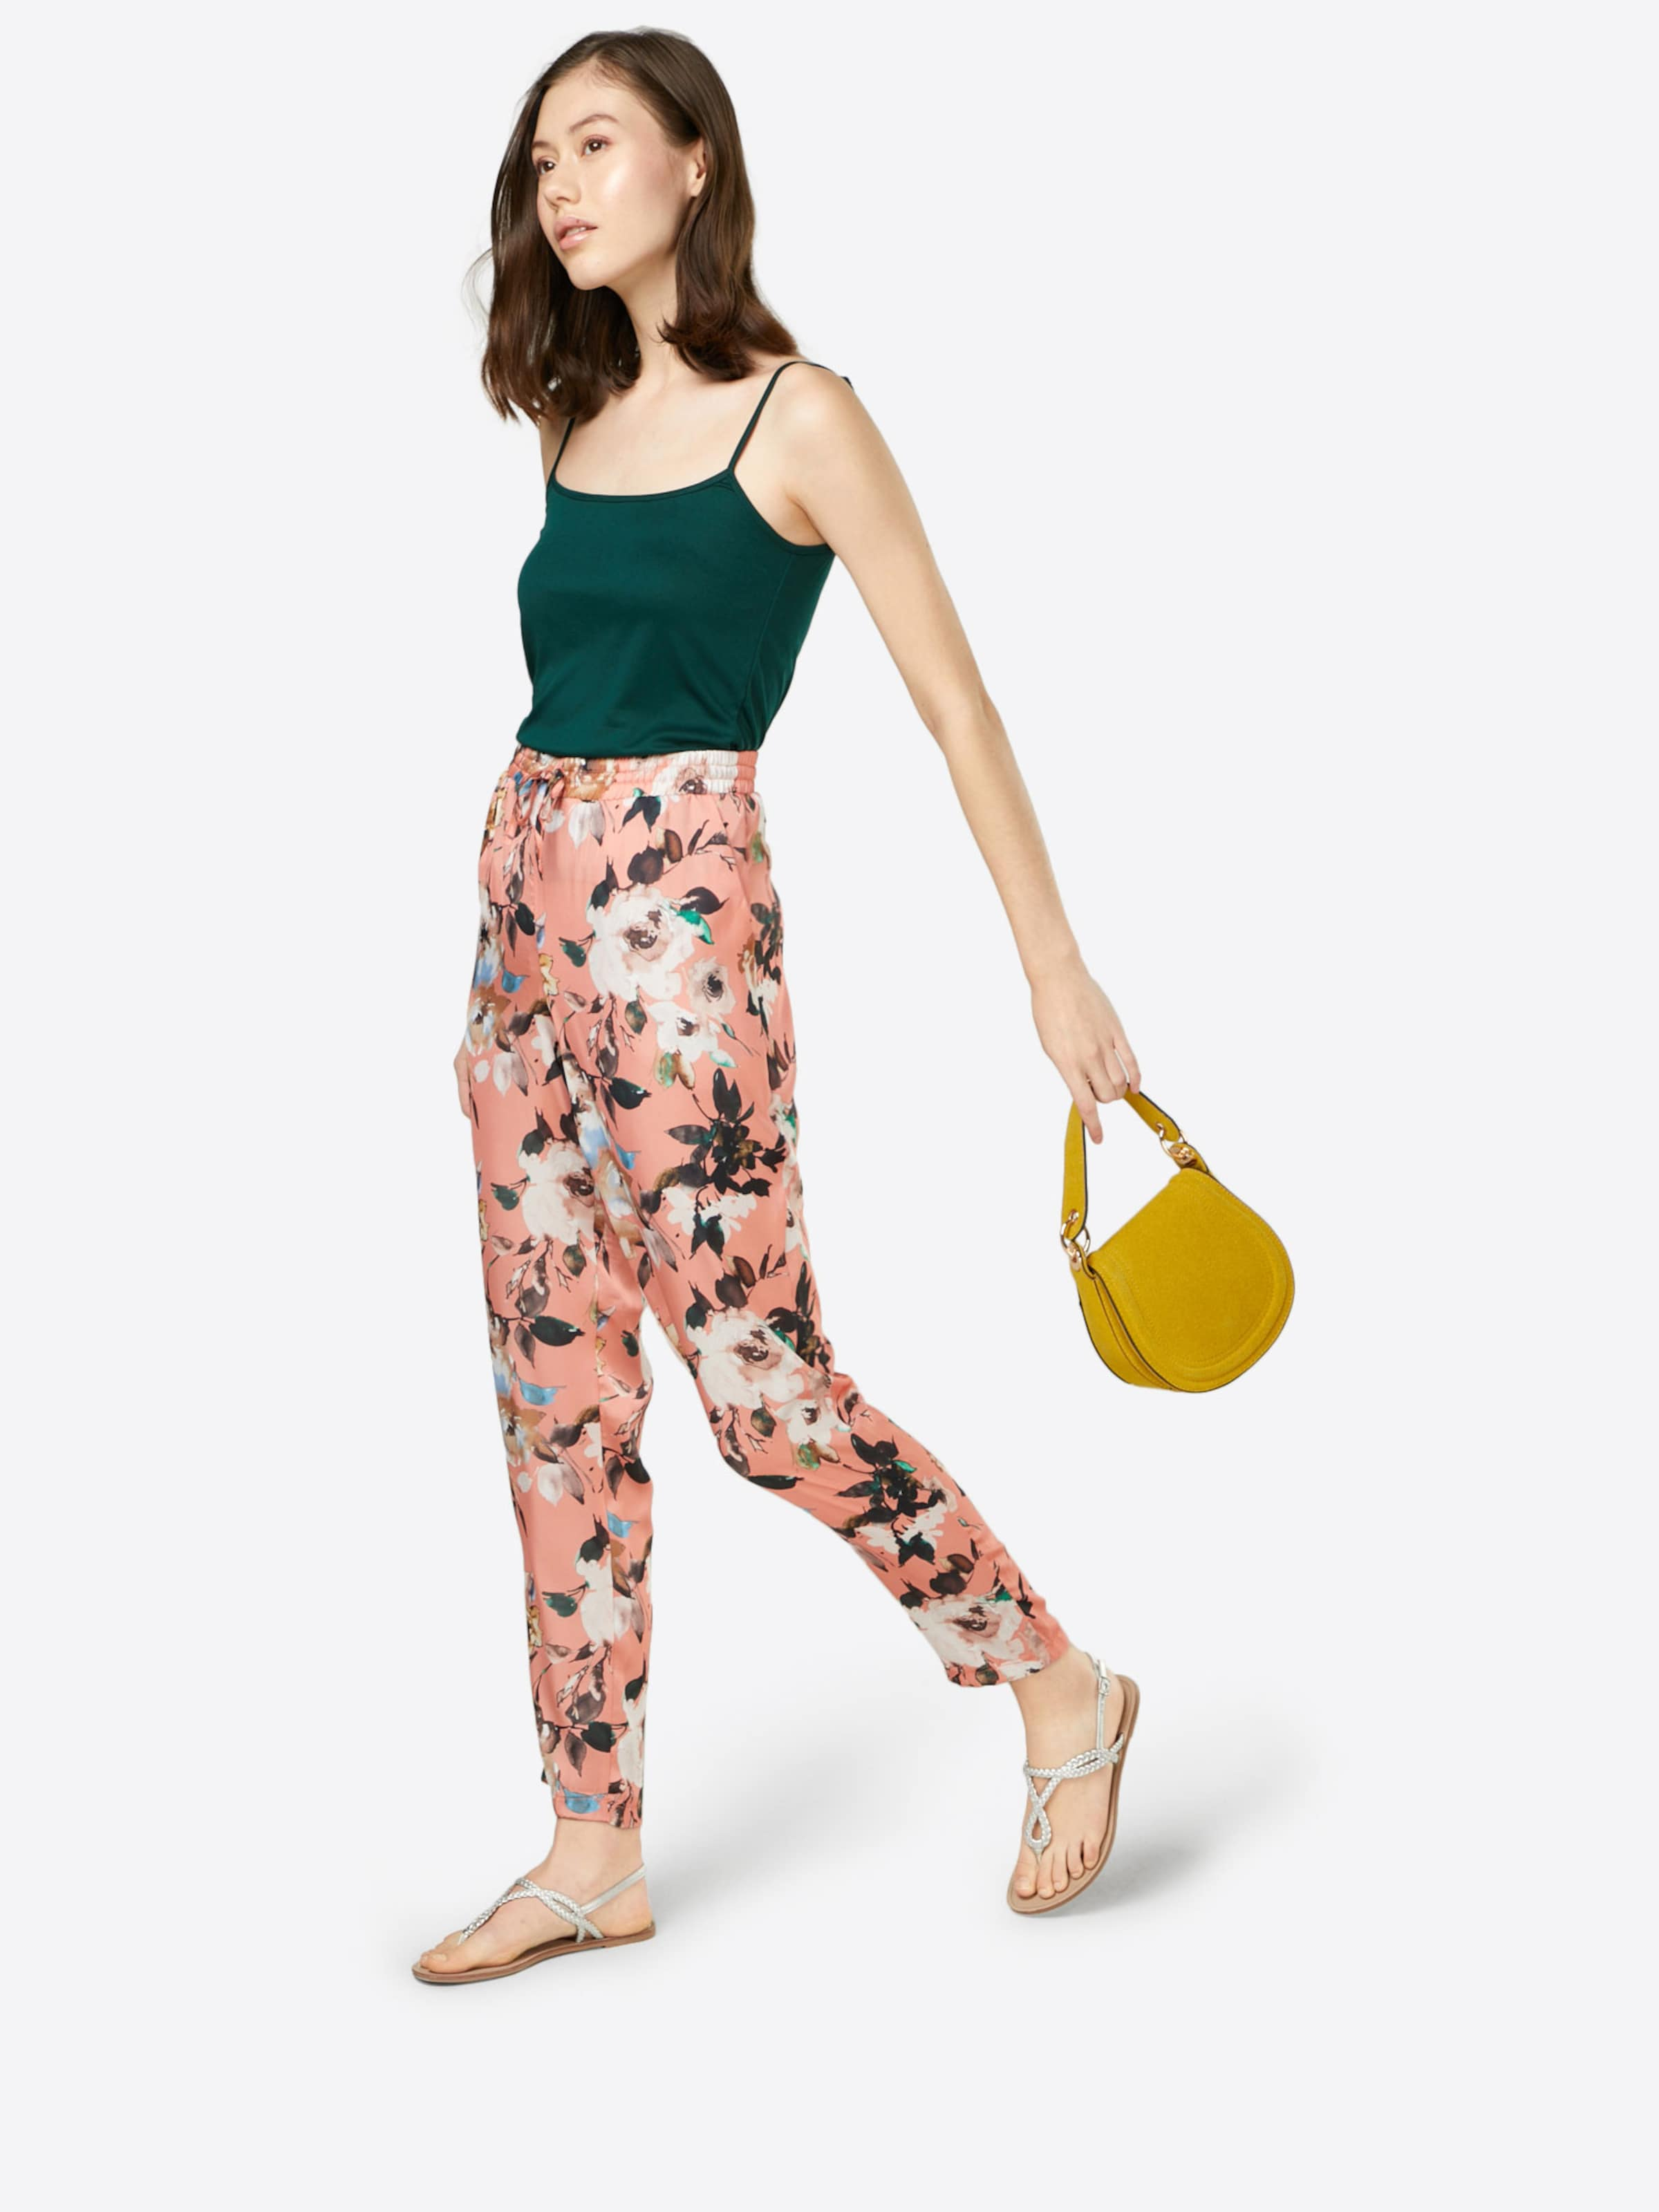 ABOUT YOU Hose 'Naomi' Mode-Stil Zu Verkaufen cU5Ww3oP